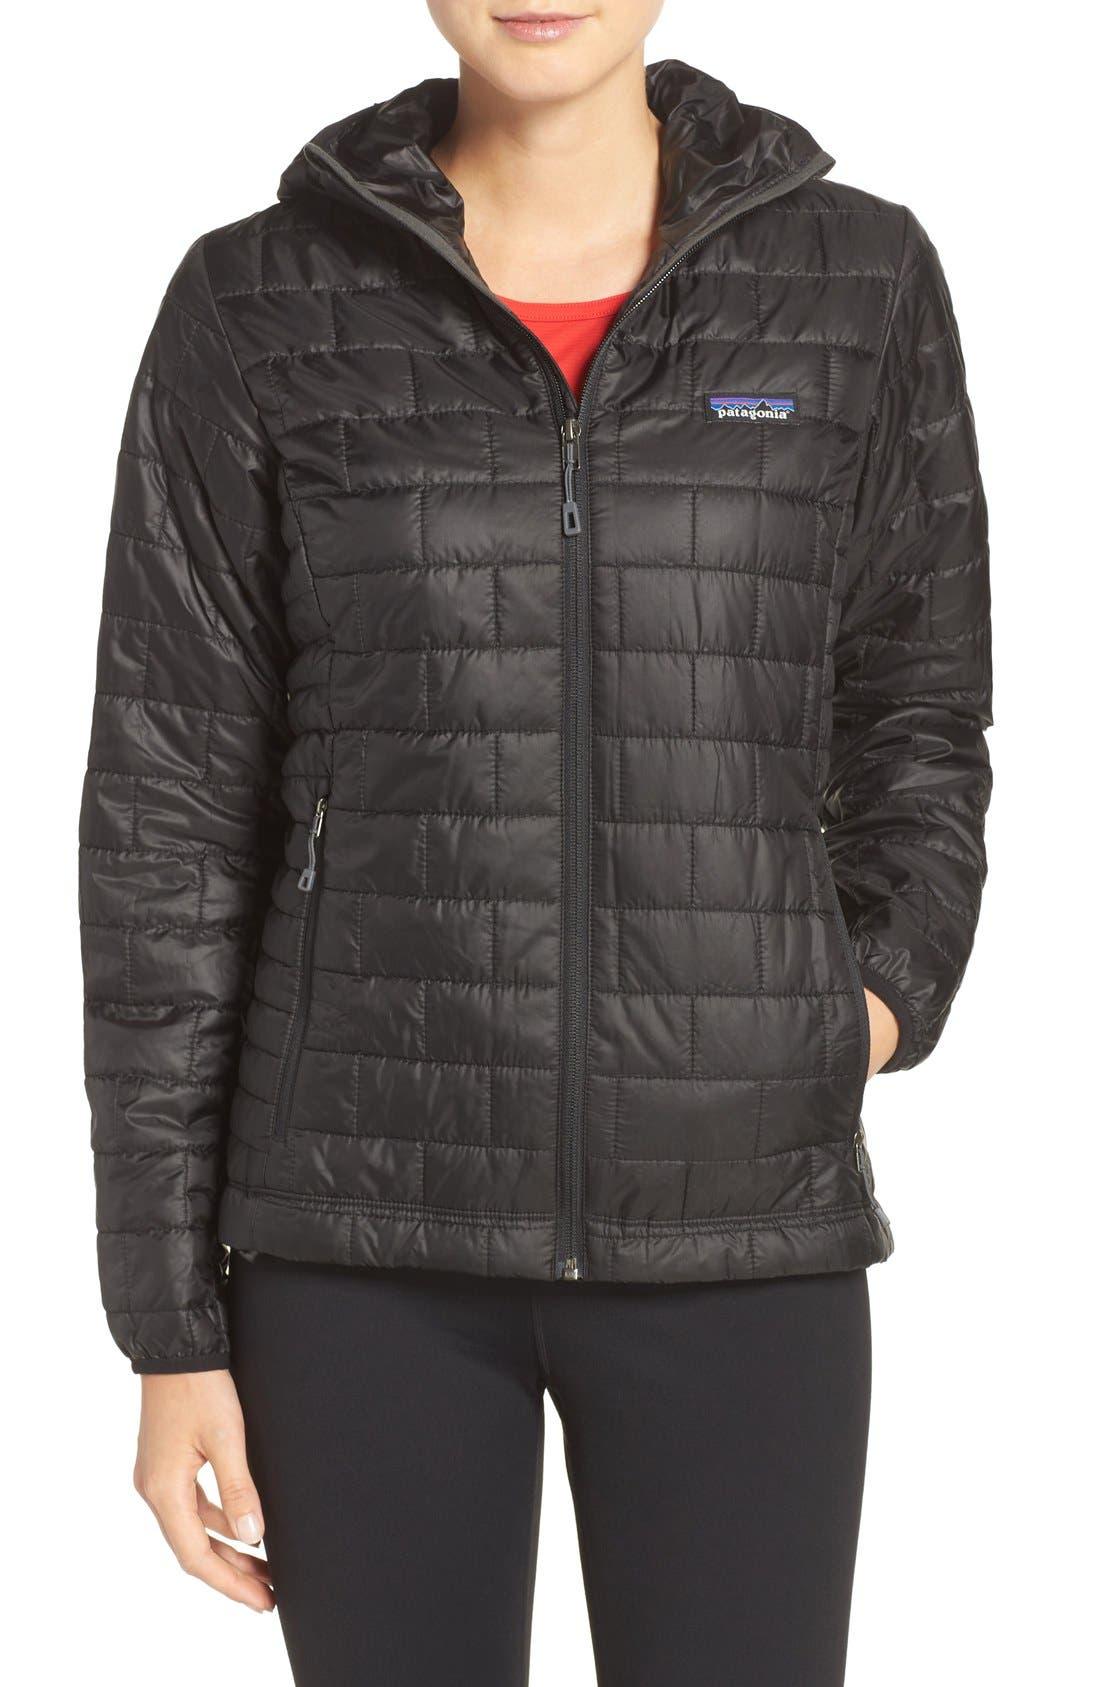 Alternate Image 1 Selected - Patagonia Nano Puff® Hooded Water Resistant Jacket